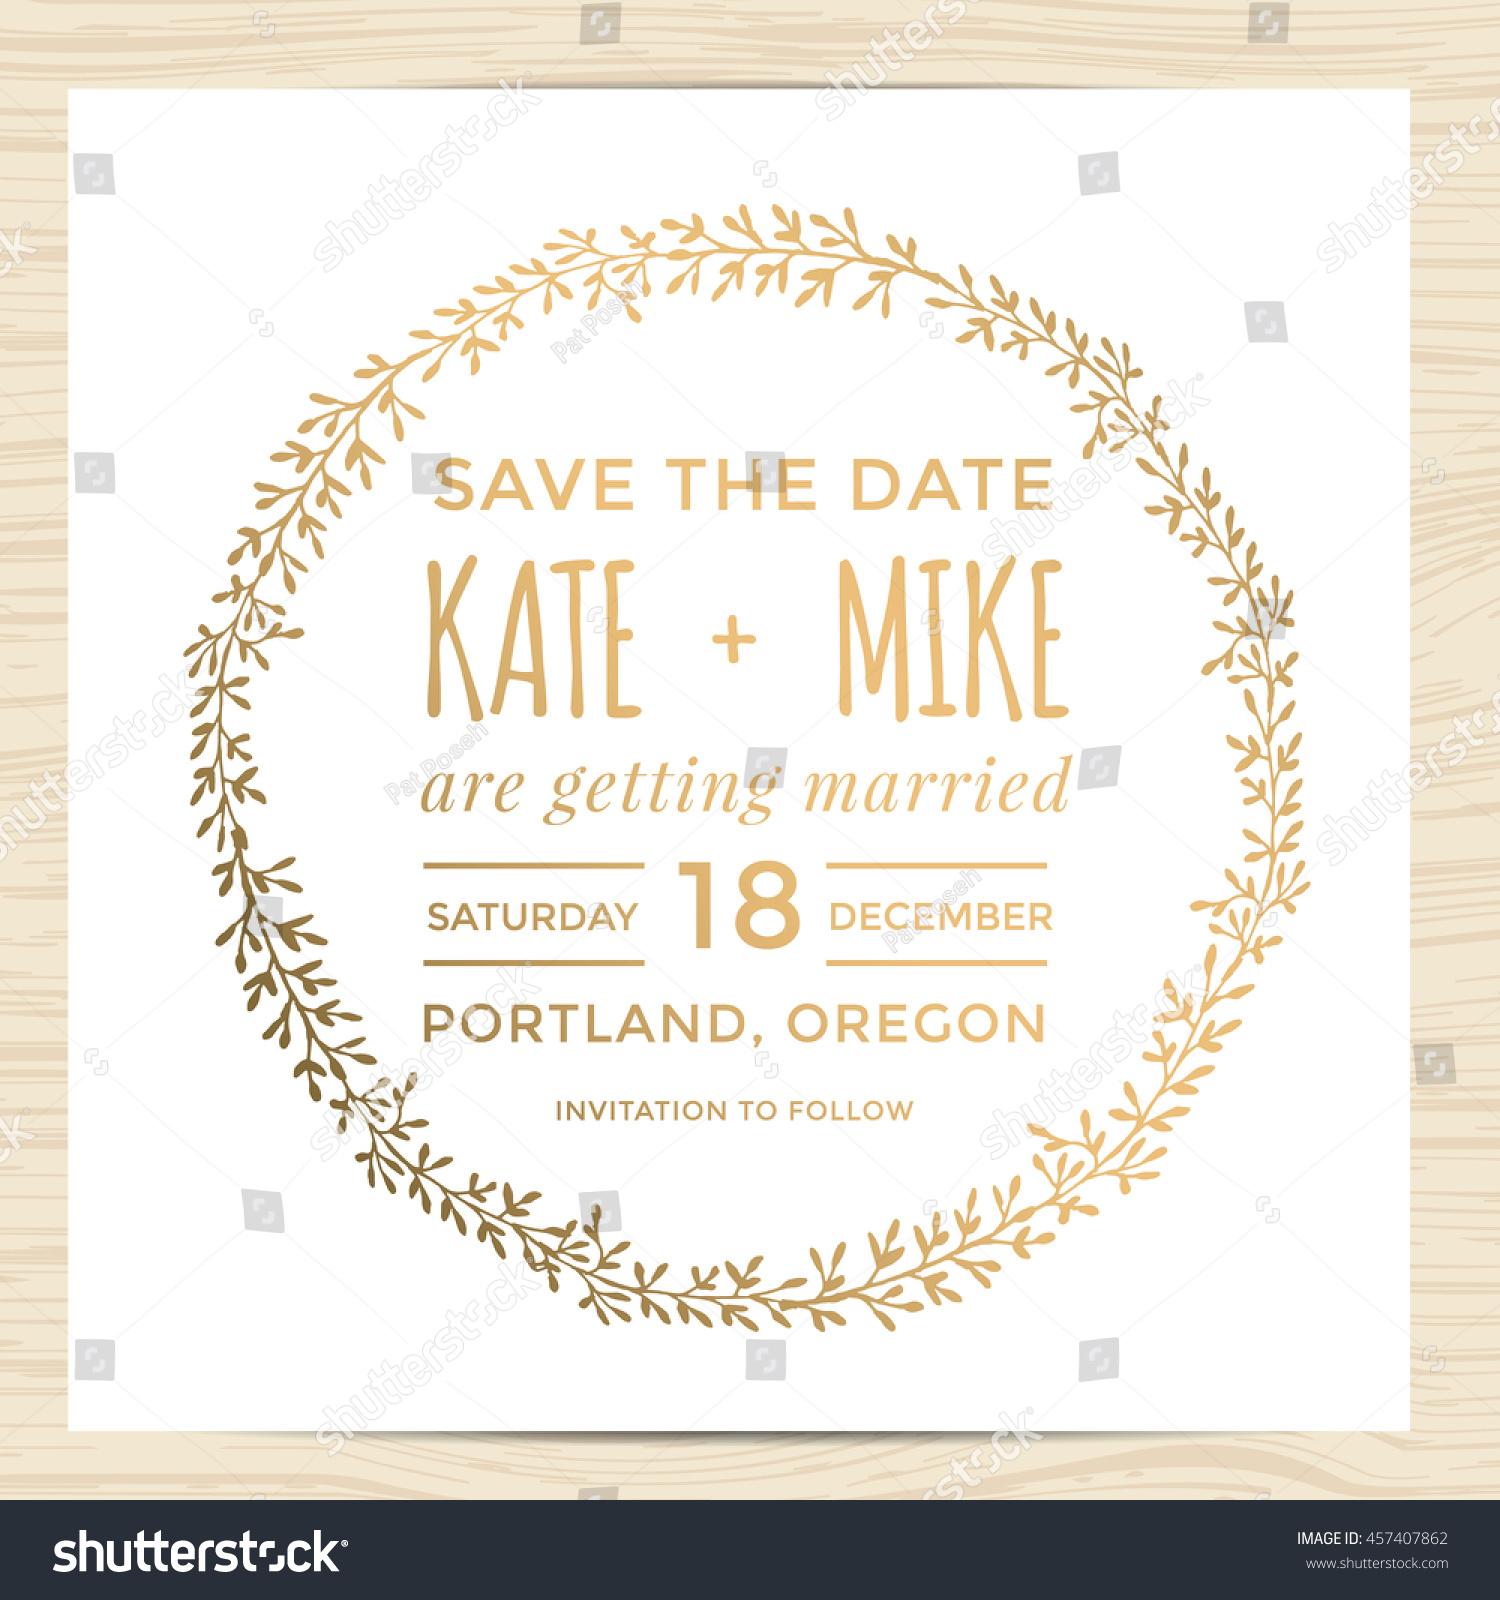 save date wedding invitation card template stock vector 457407862 shutterstock. Black Bedroom Furniture Sets. Home Design Ideas